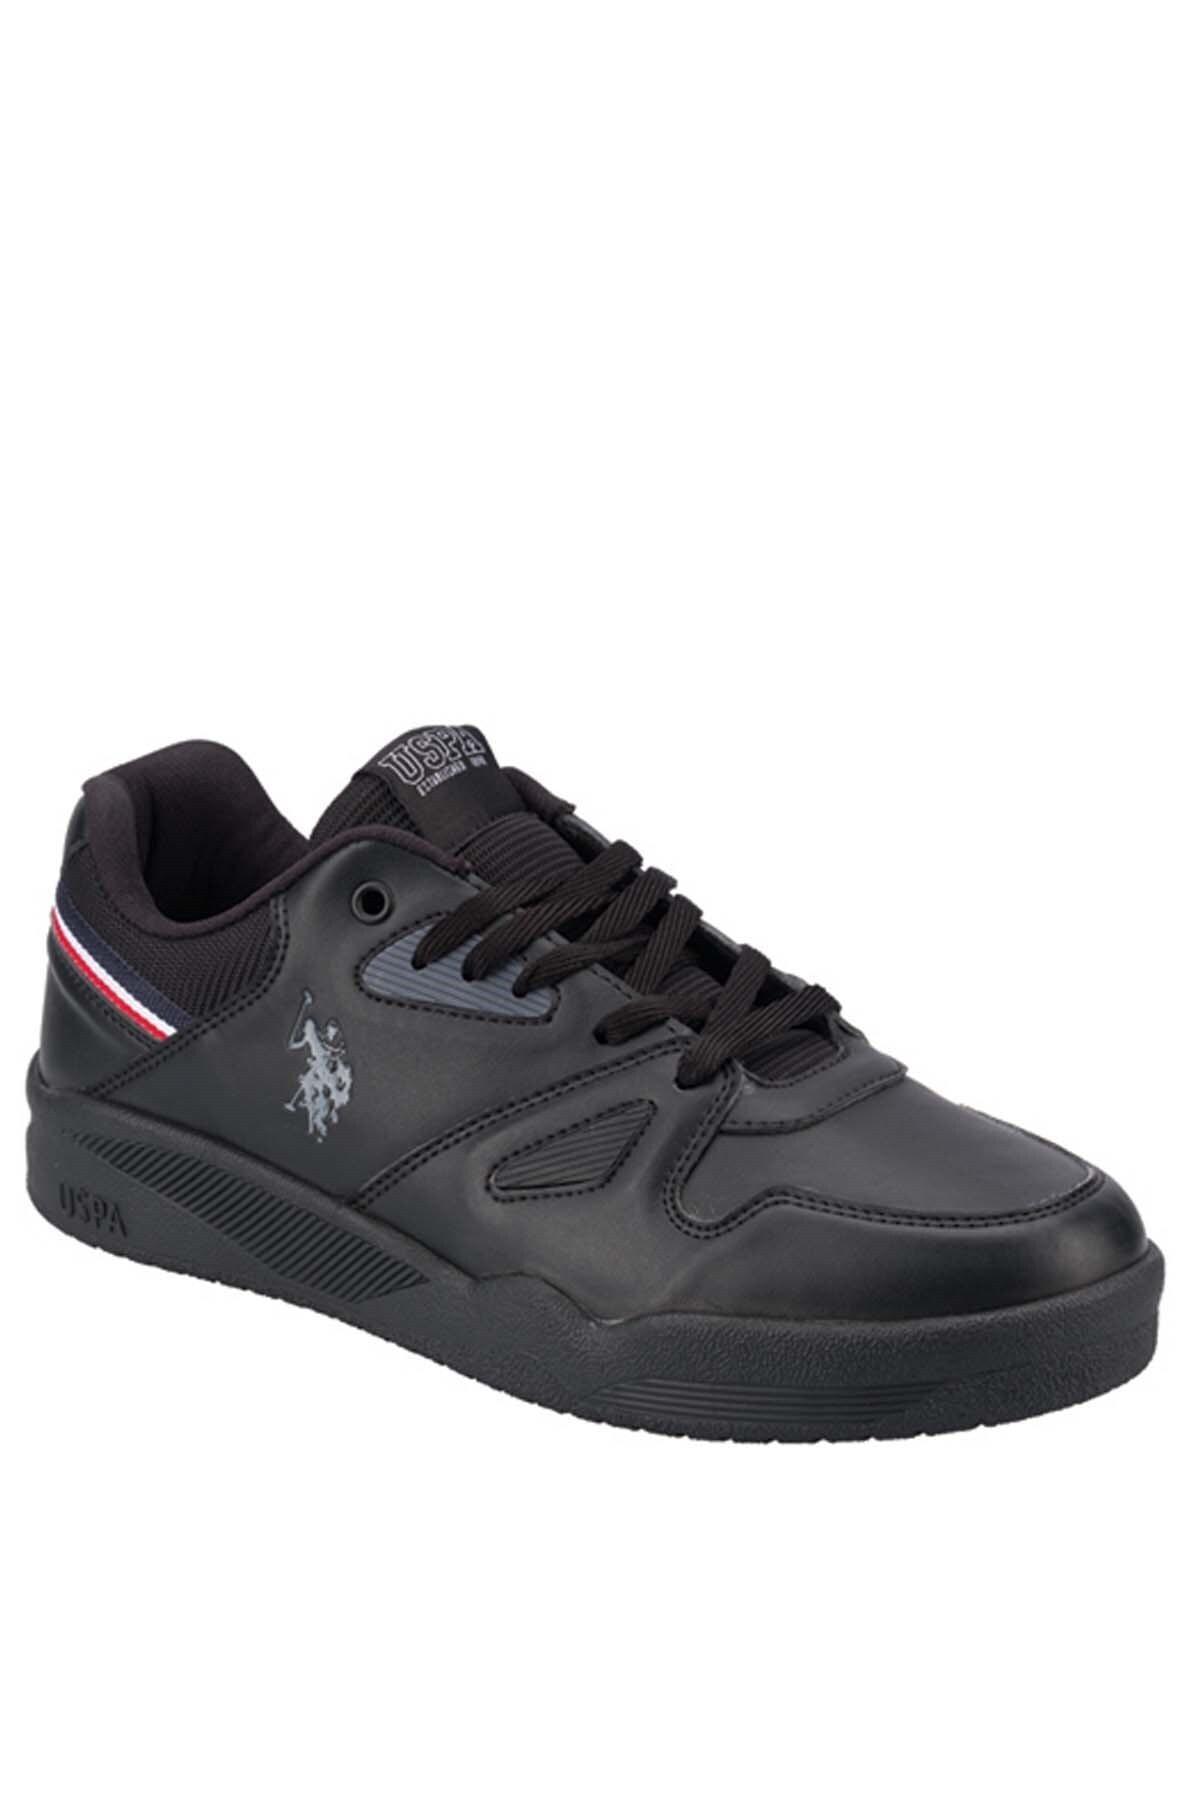 U.S POLO PARKER Siyah Erkek Sneaker Ayakkabı 100549165 2